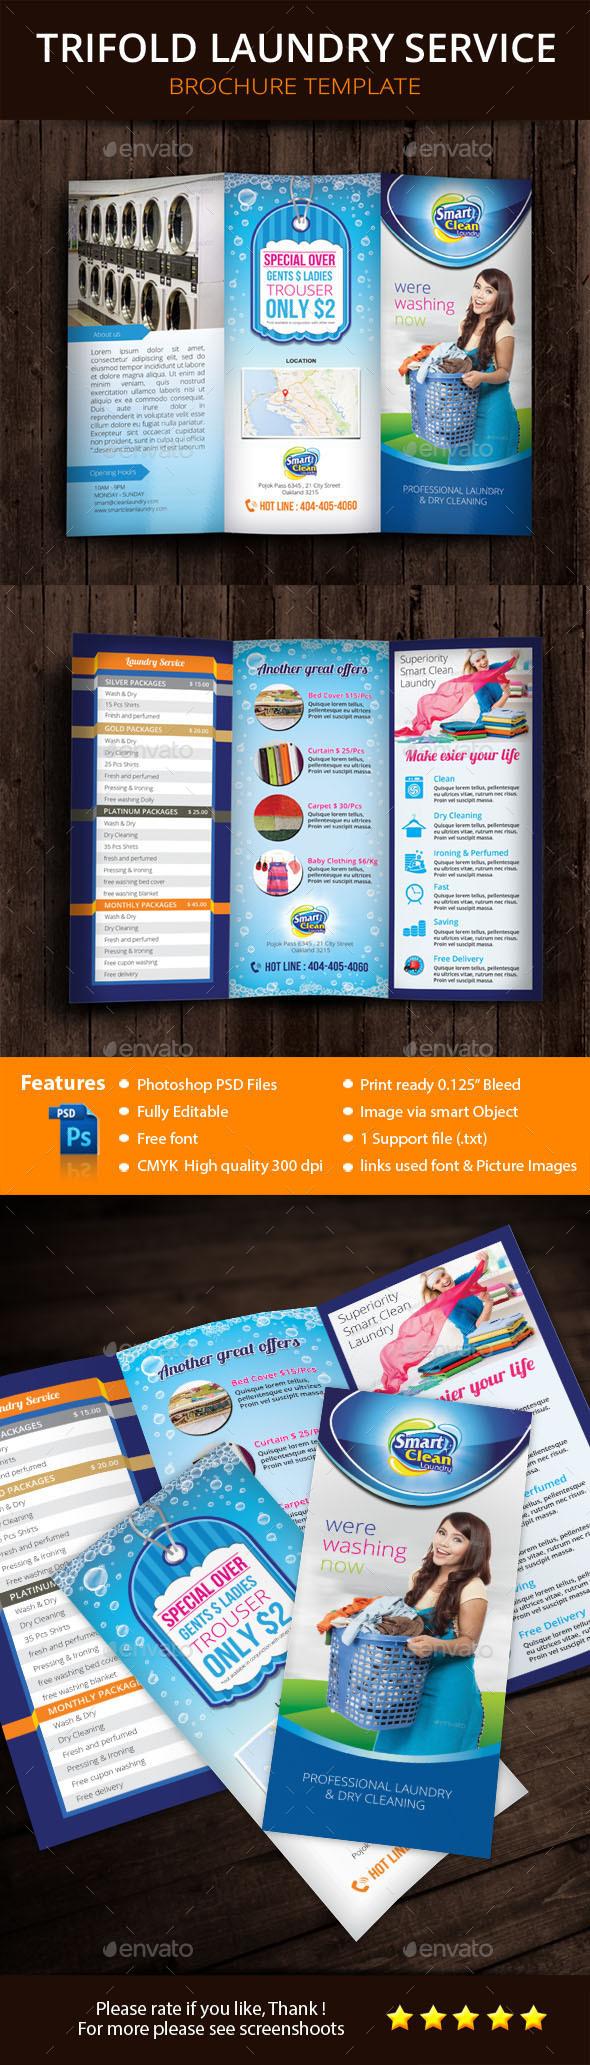 Tri Fold Laundry Service Brochure  - Brochures Print Templates